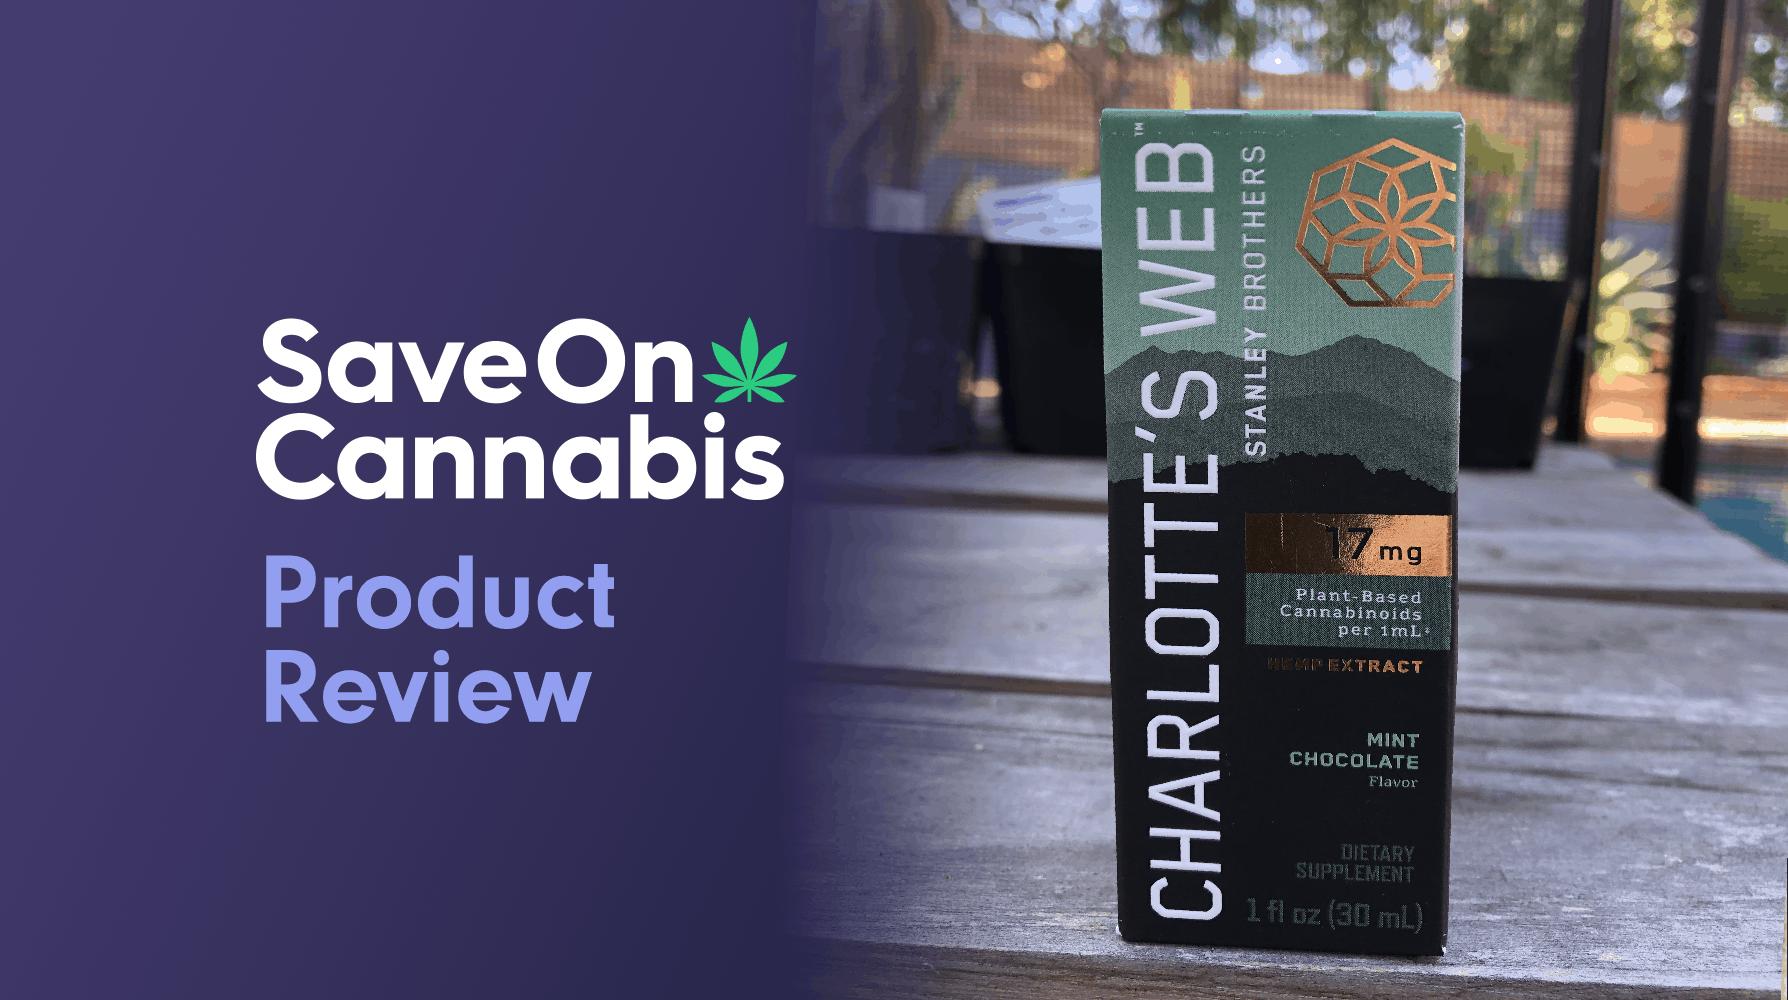 charlotte's web hemp extract mint chocolate save on cannabis website